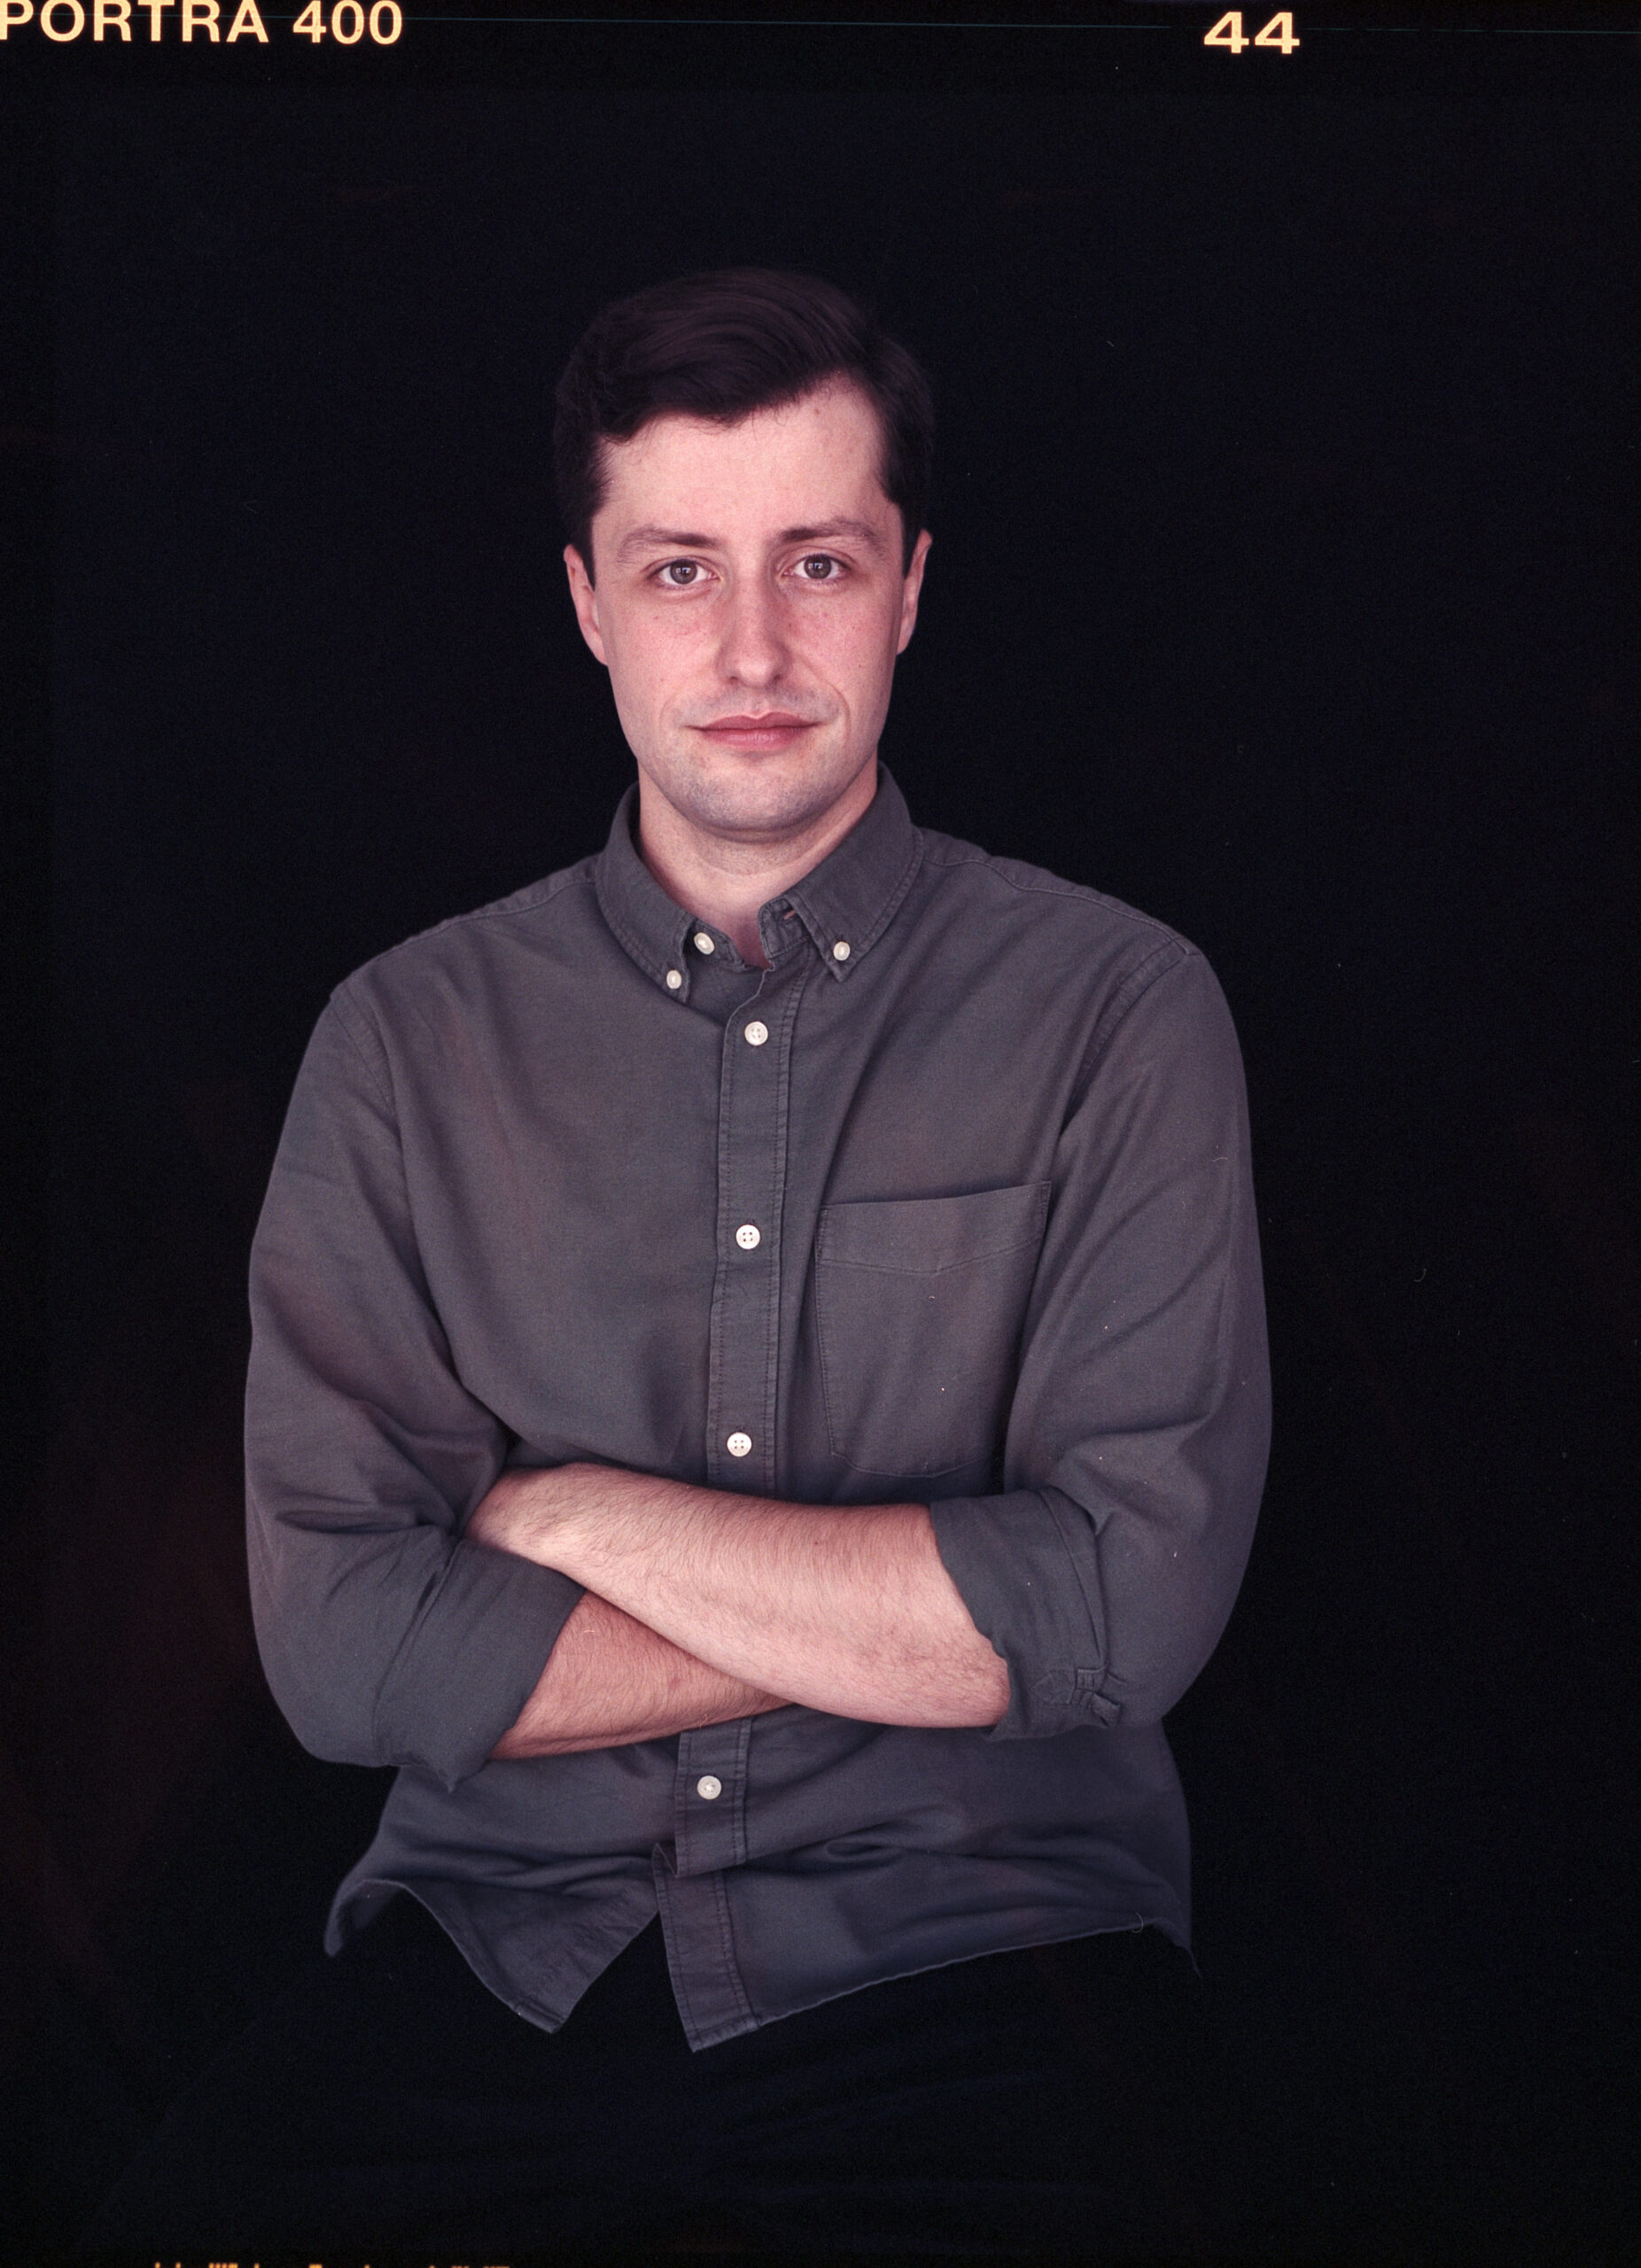 Fot. Łukasz Saturczak